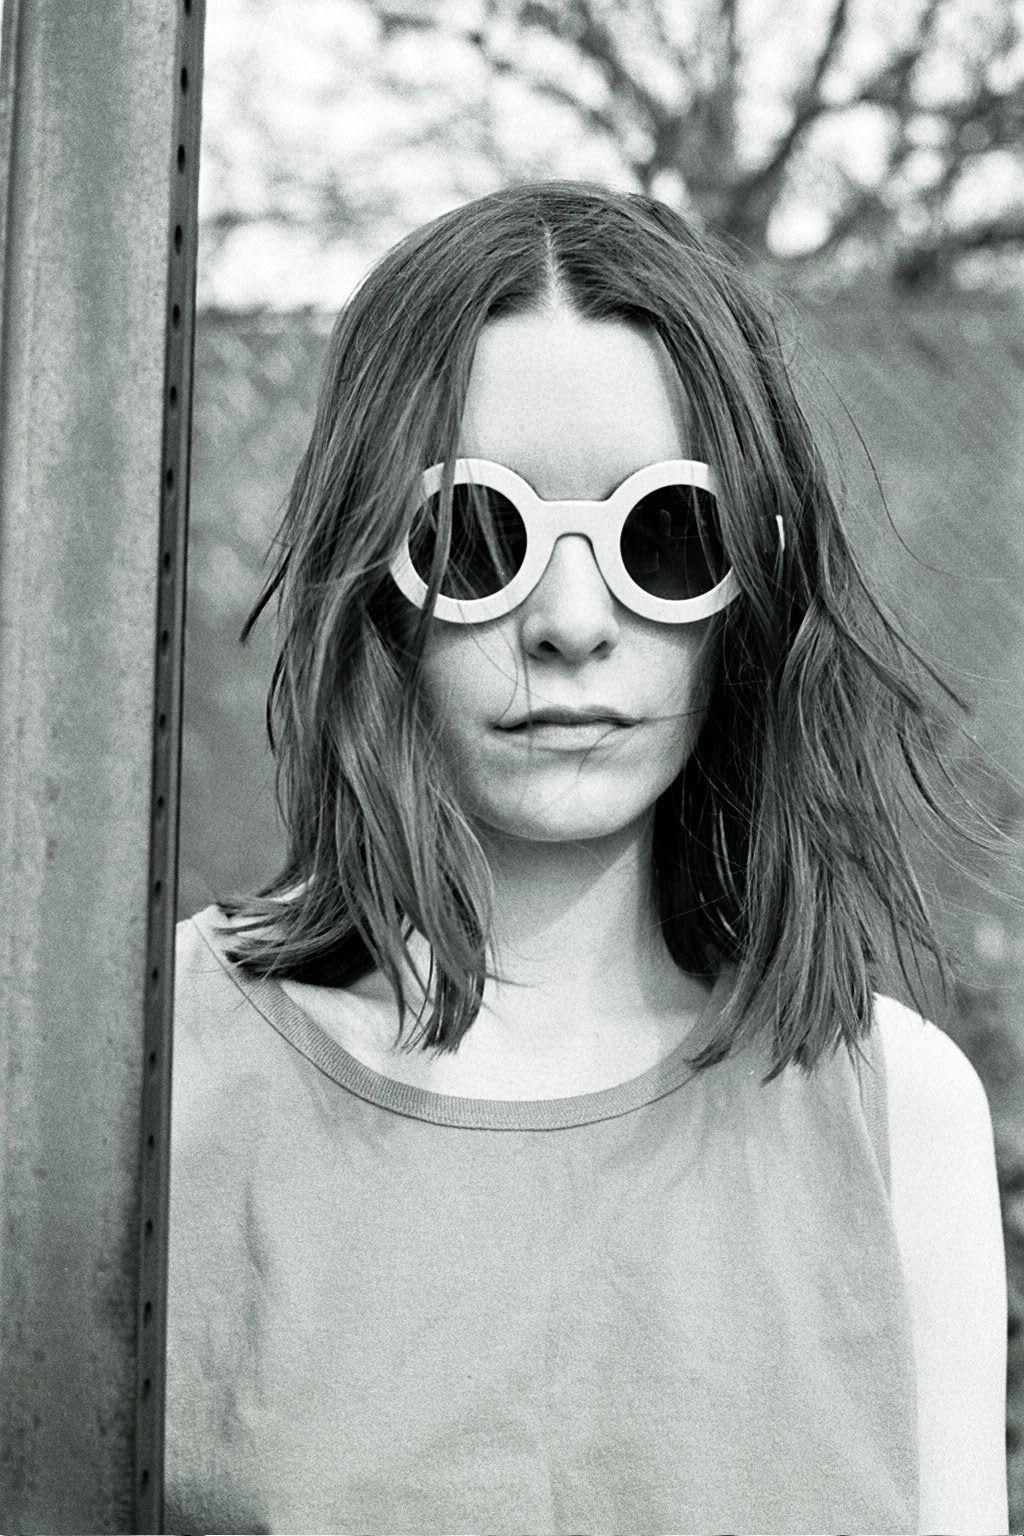 Round Sunglasses #style #fashion #accessories